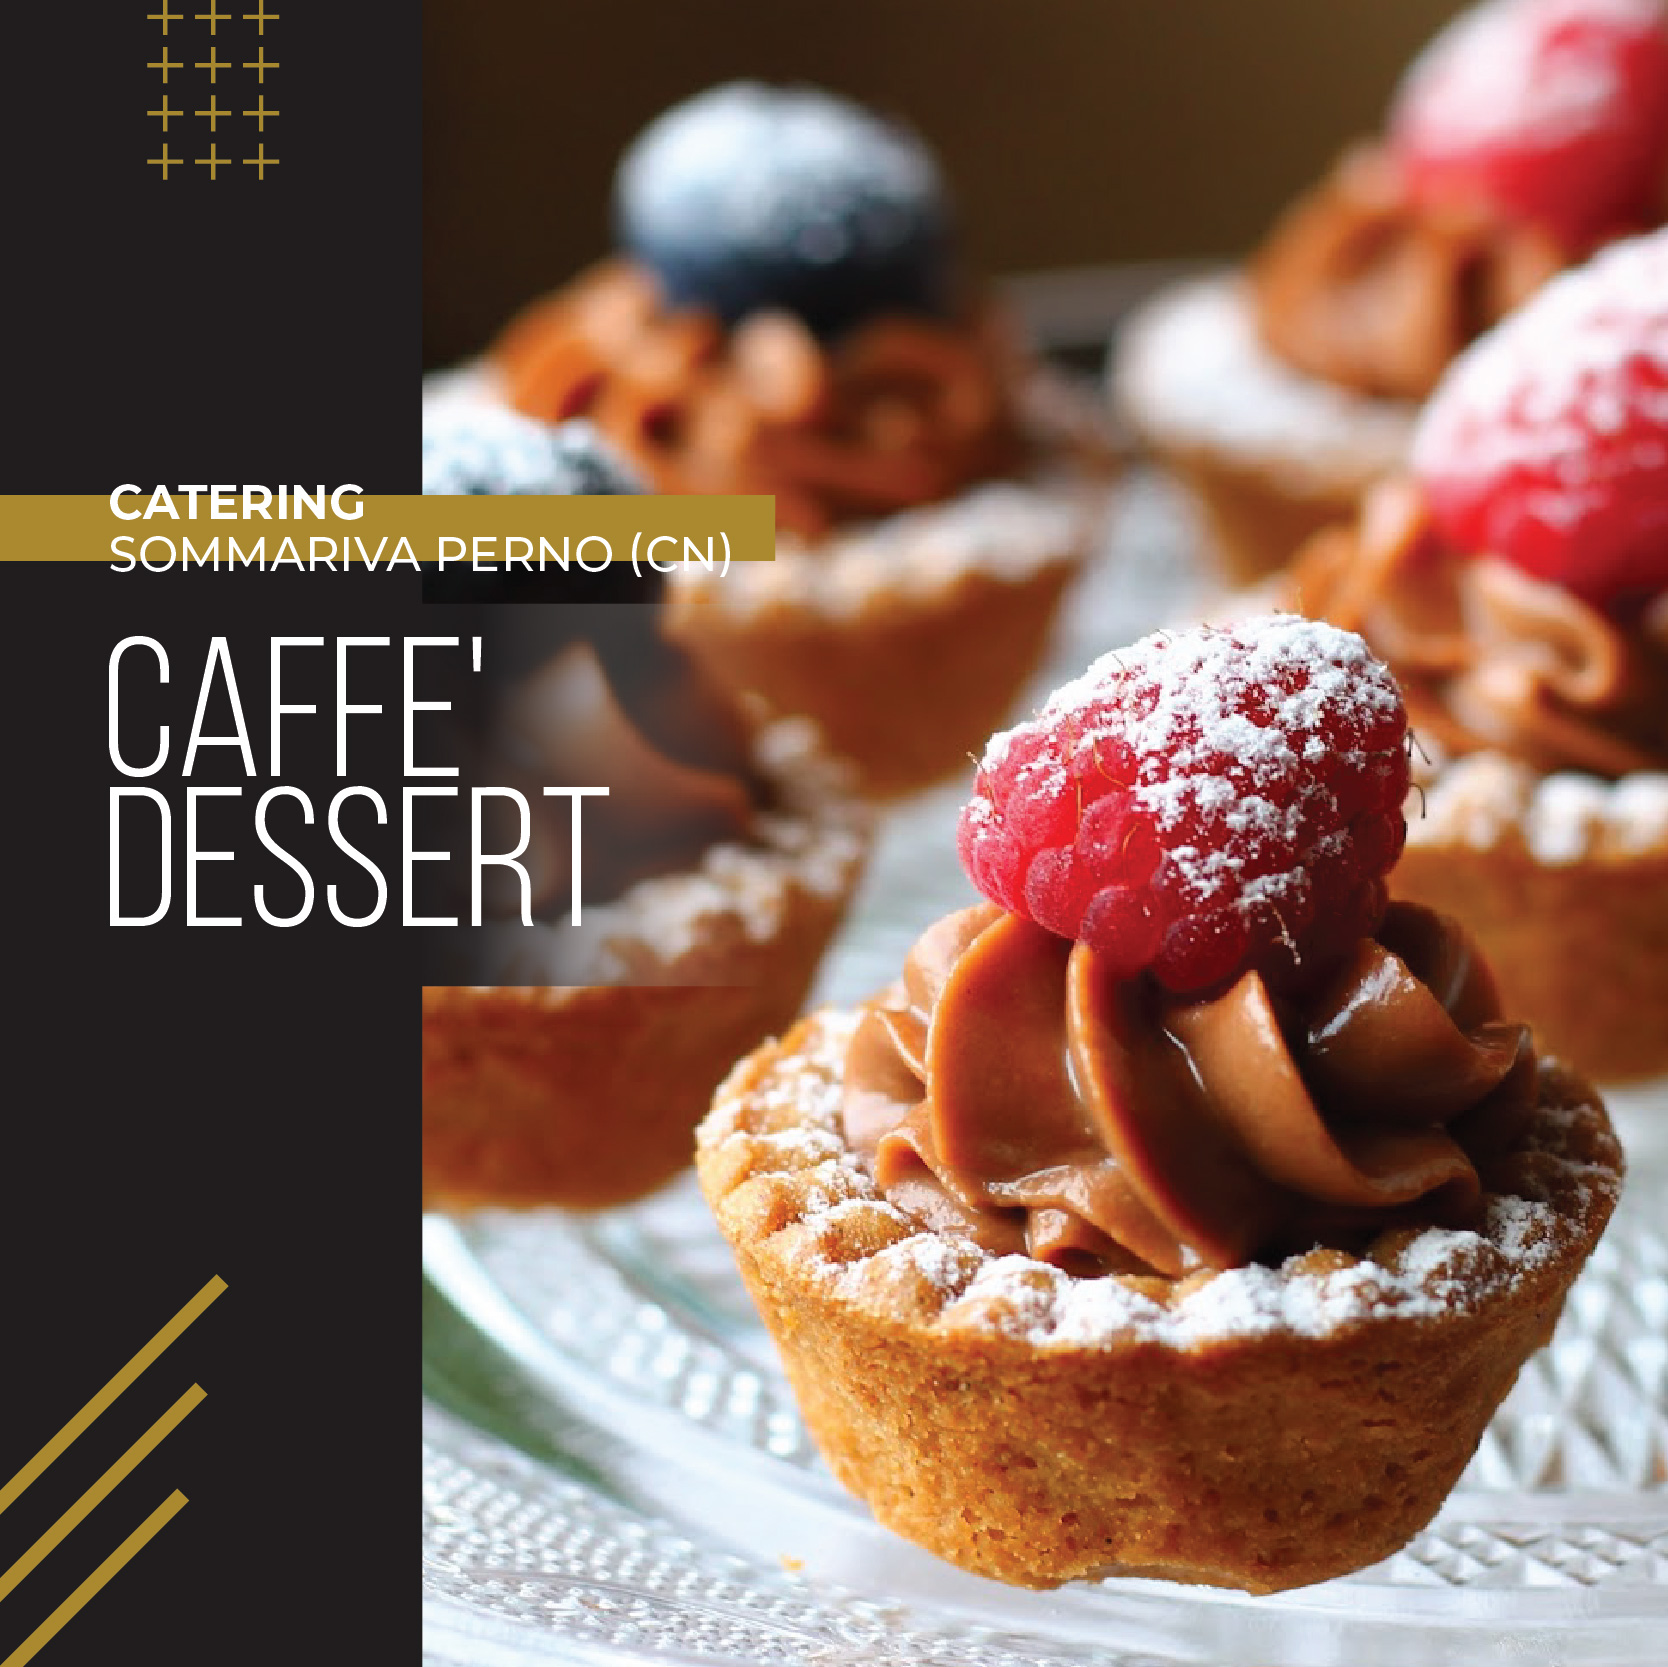 CAFFE' DESSERT